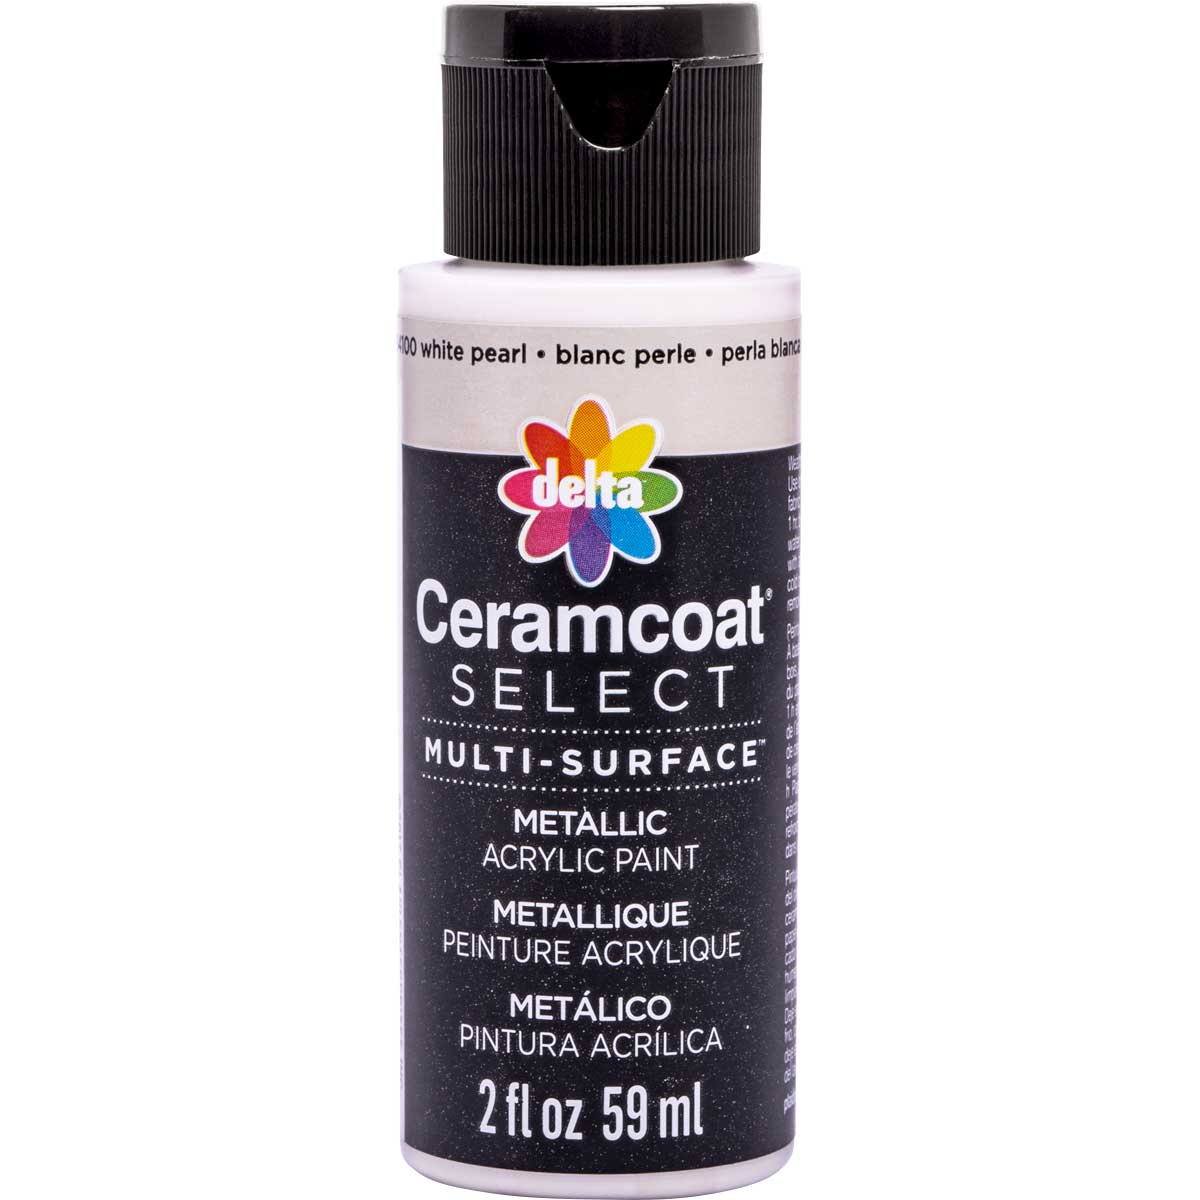 Delta Ceramcoat ® Select Multi-Surface Acrylic Paint - Metallic - White Pearl, 2 oz. - 04100